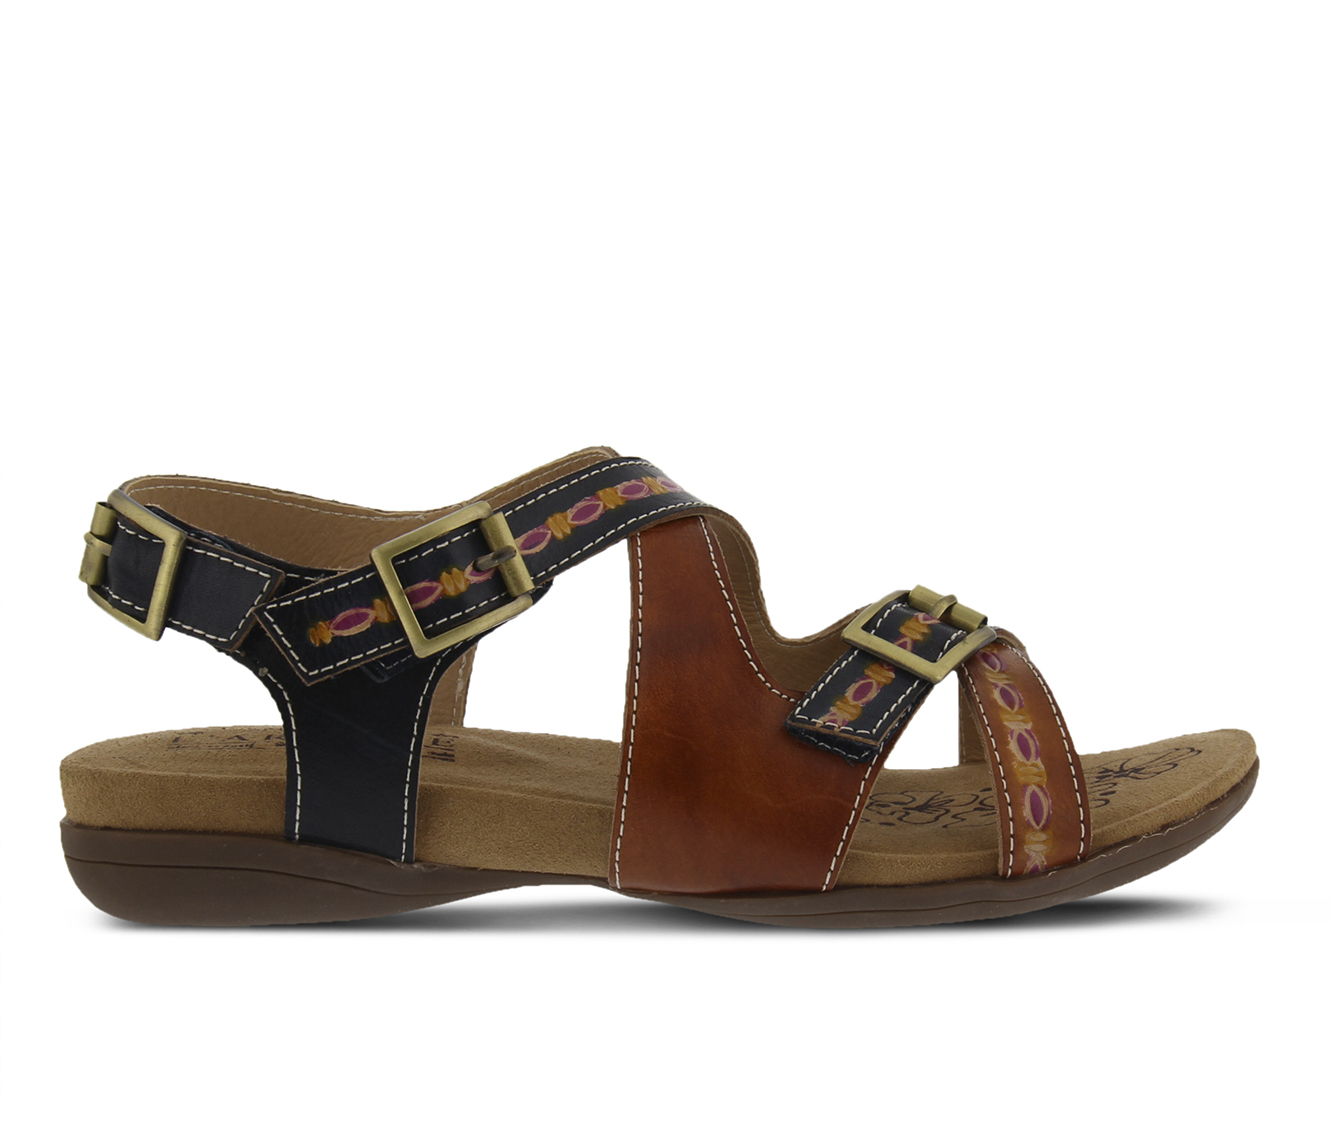 L'Artiste Lilliana Women's Sandal (Beige Leather)